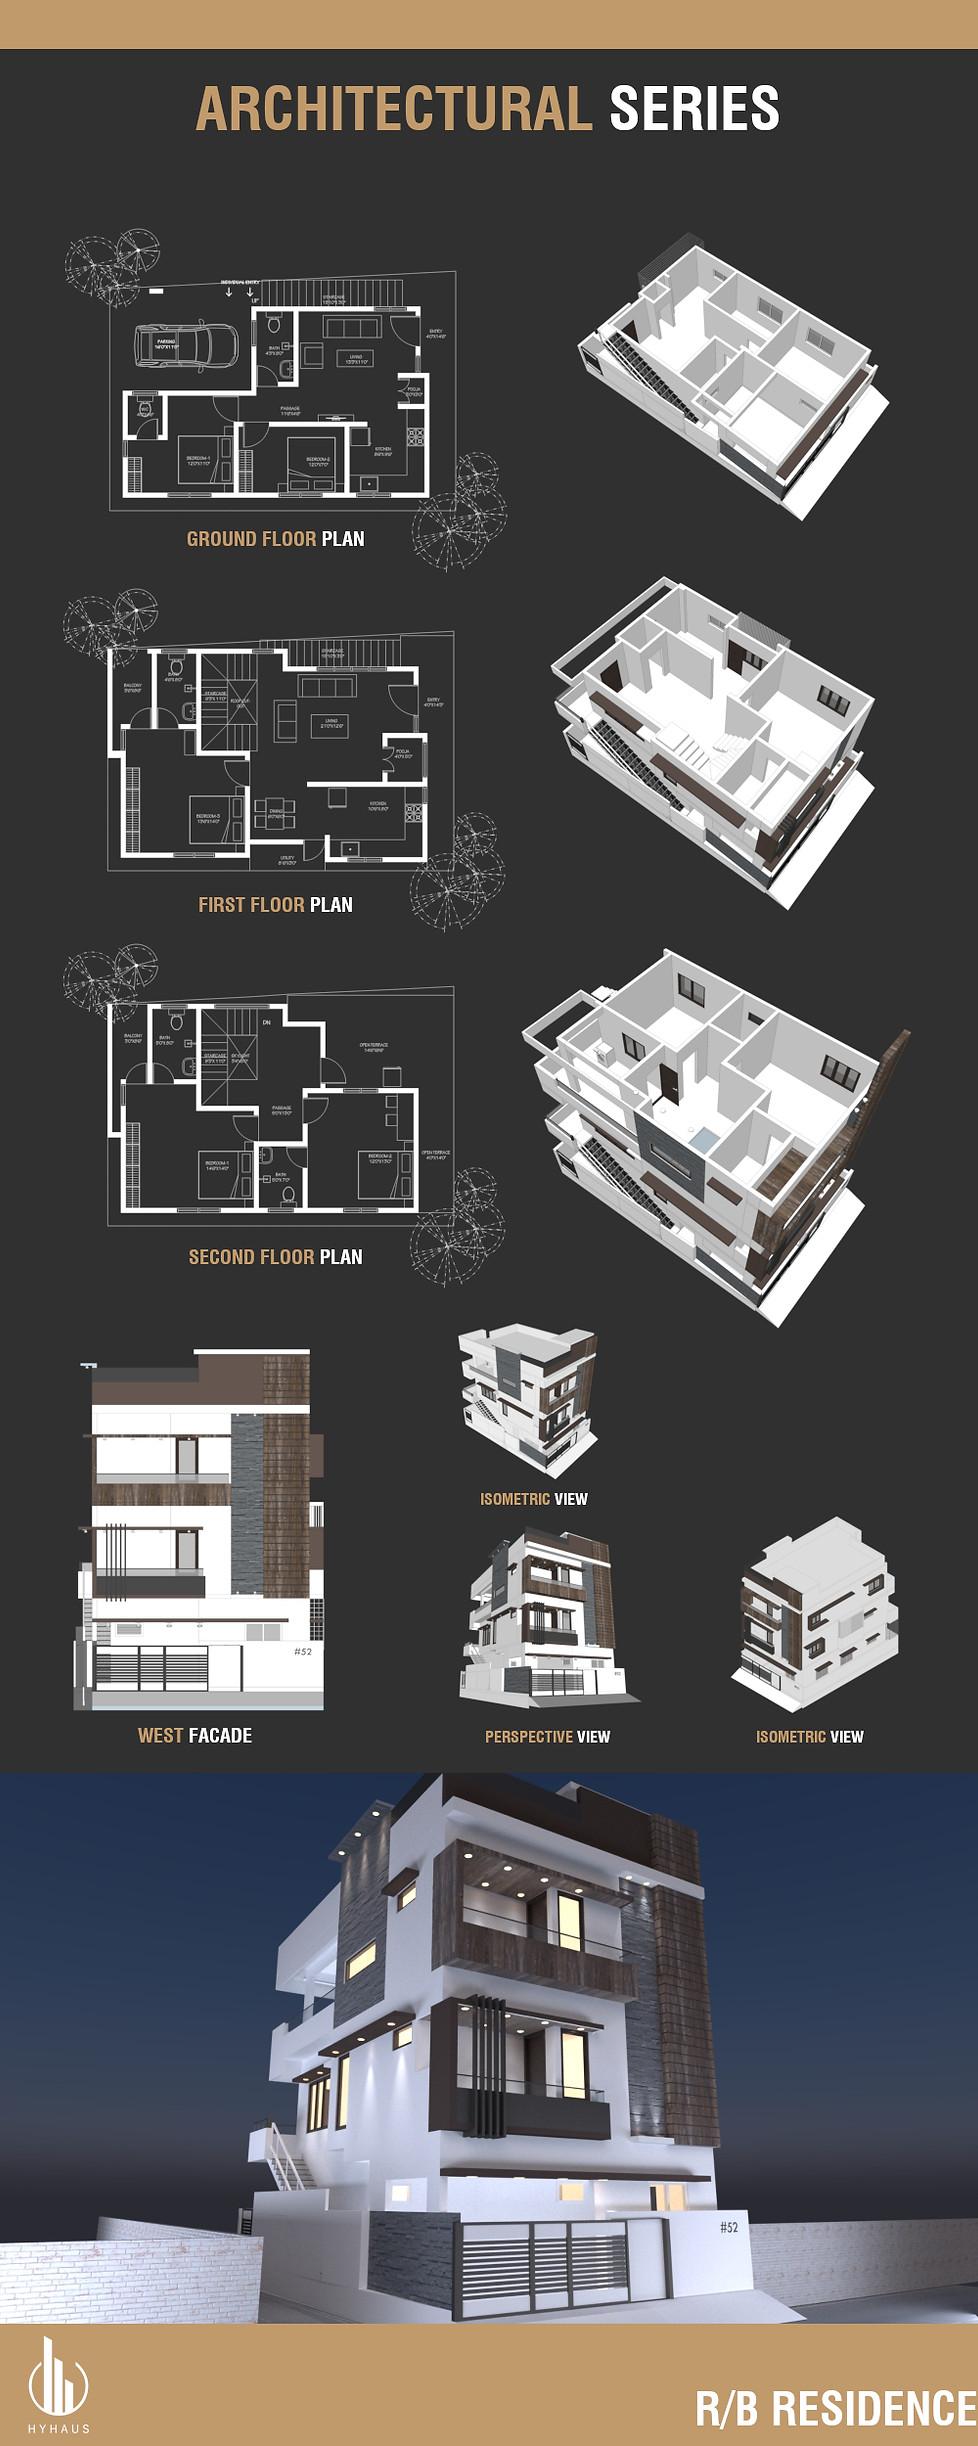 architectural series ramesh.jpg